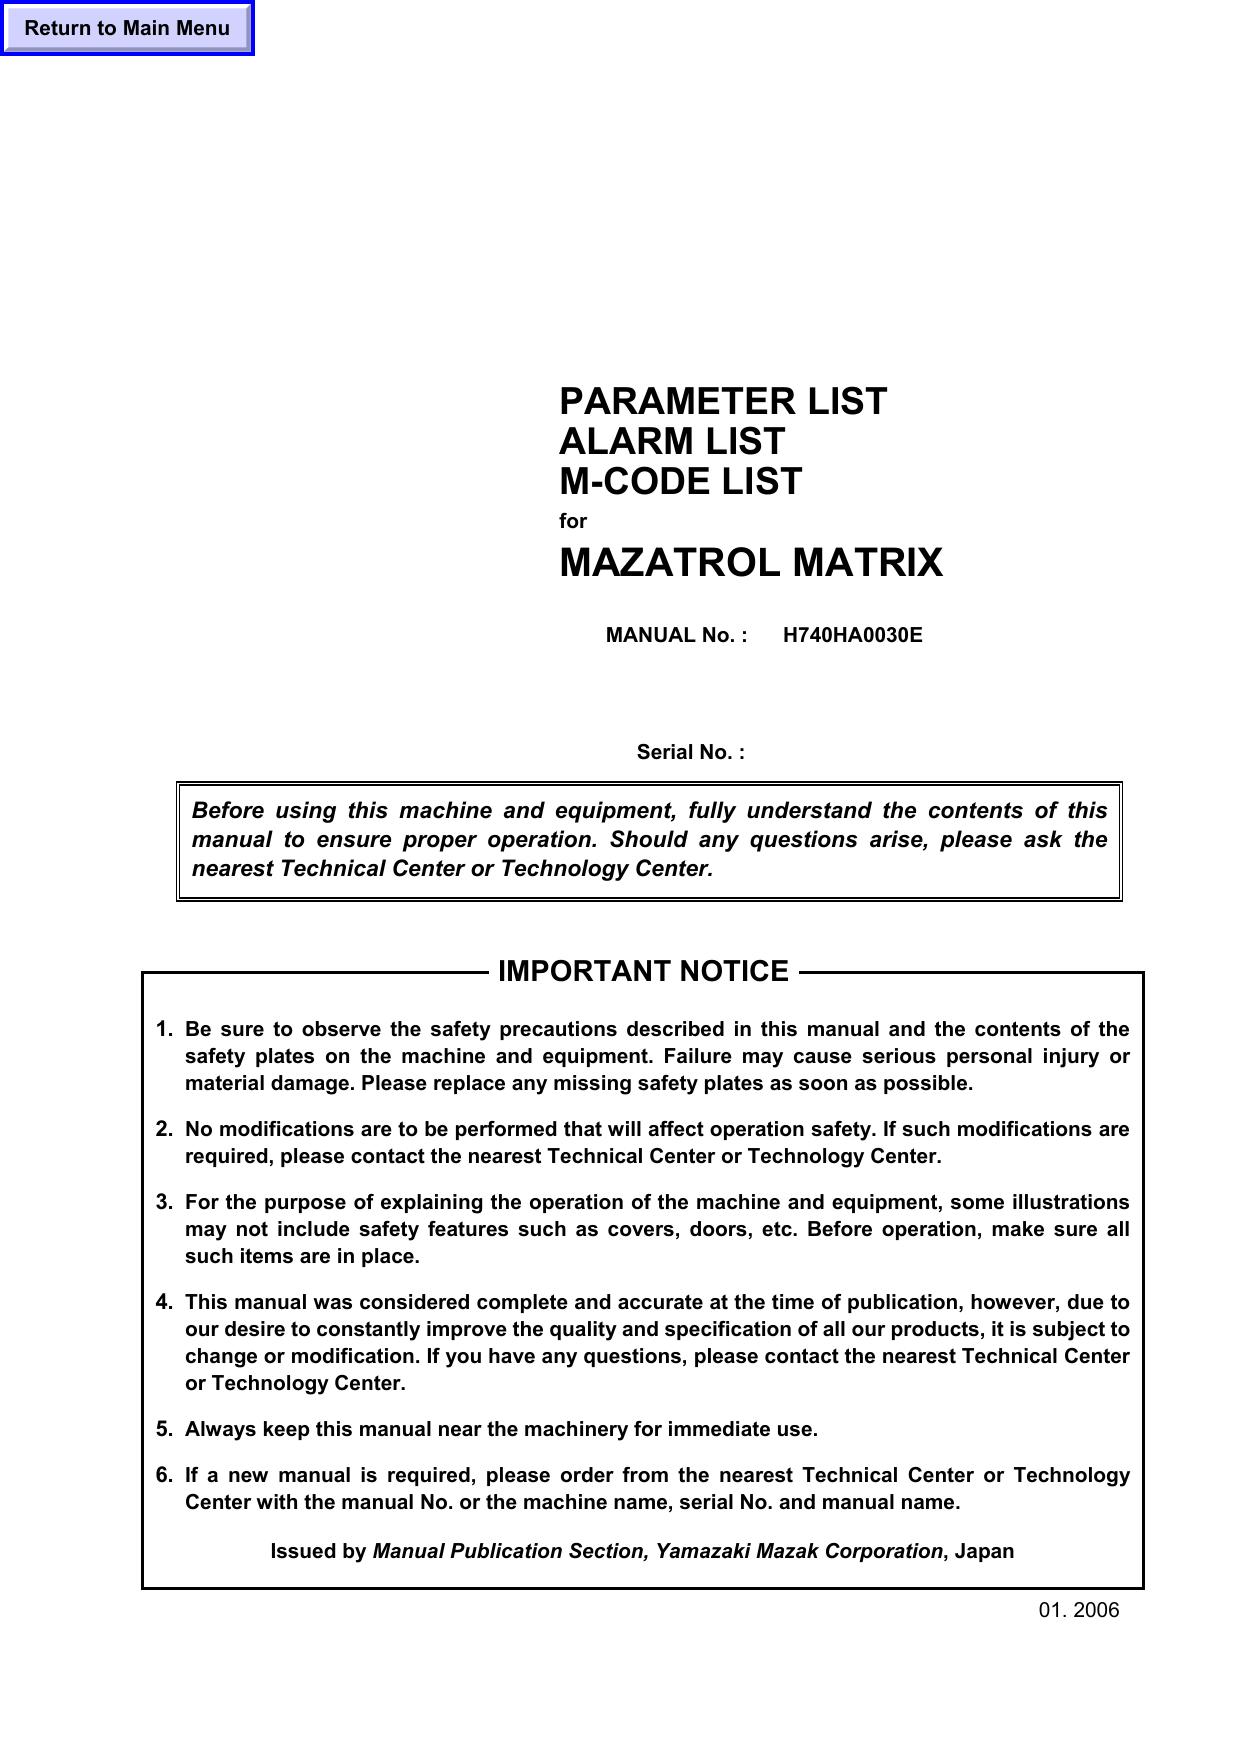 PARAMETER LIST ALARM LIST M-CODE LIST